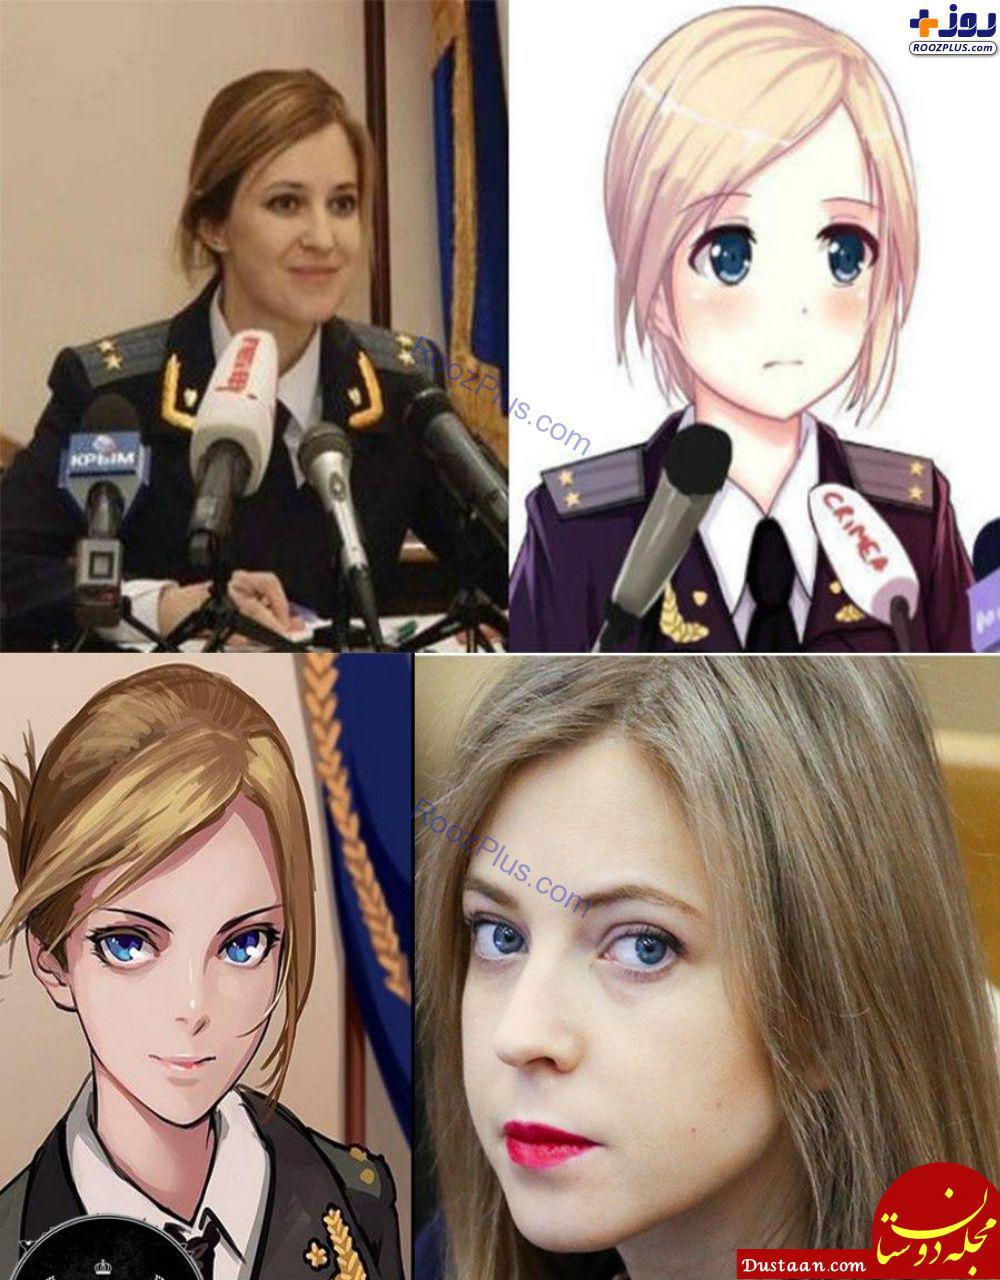 www.dustaan.com مجبوب ترین رئیس پلیس زن جهان! +عکس